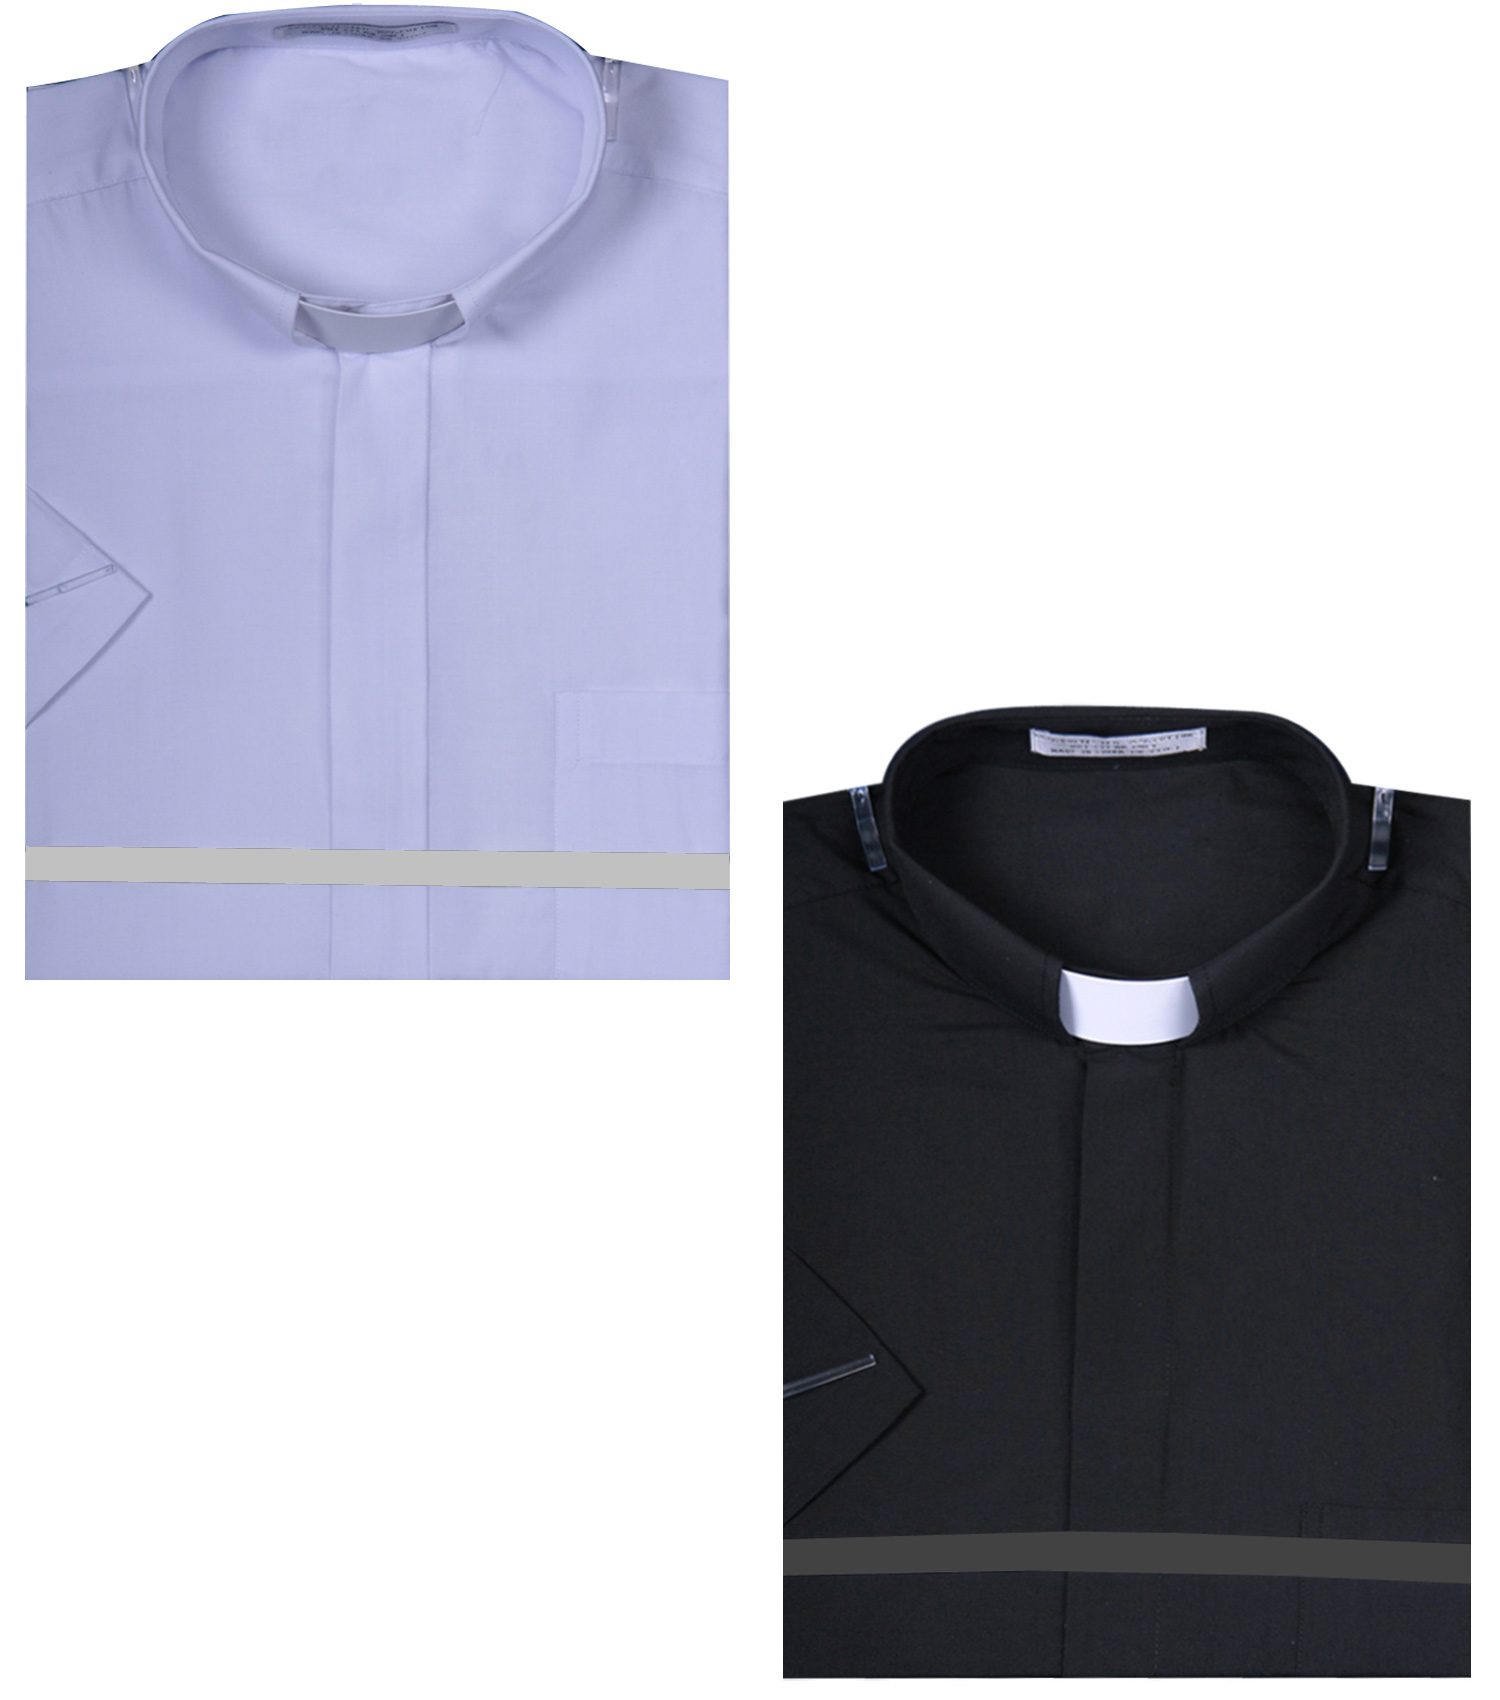 Mens Short Sleeve Solid Color Tab Collar Clergy Shirt Ebay